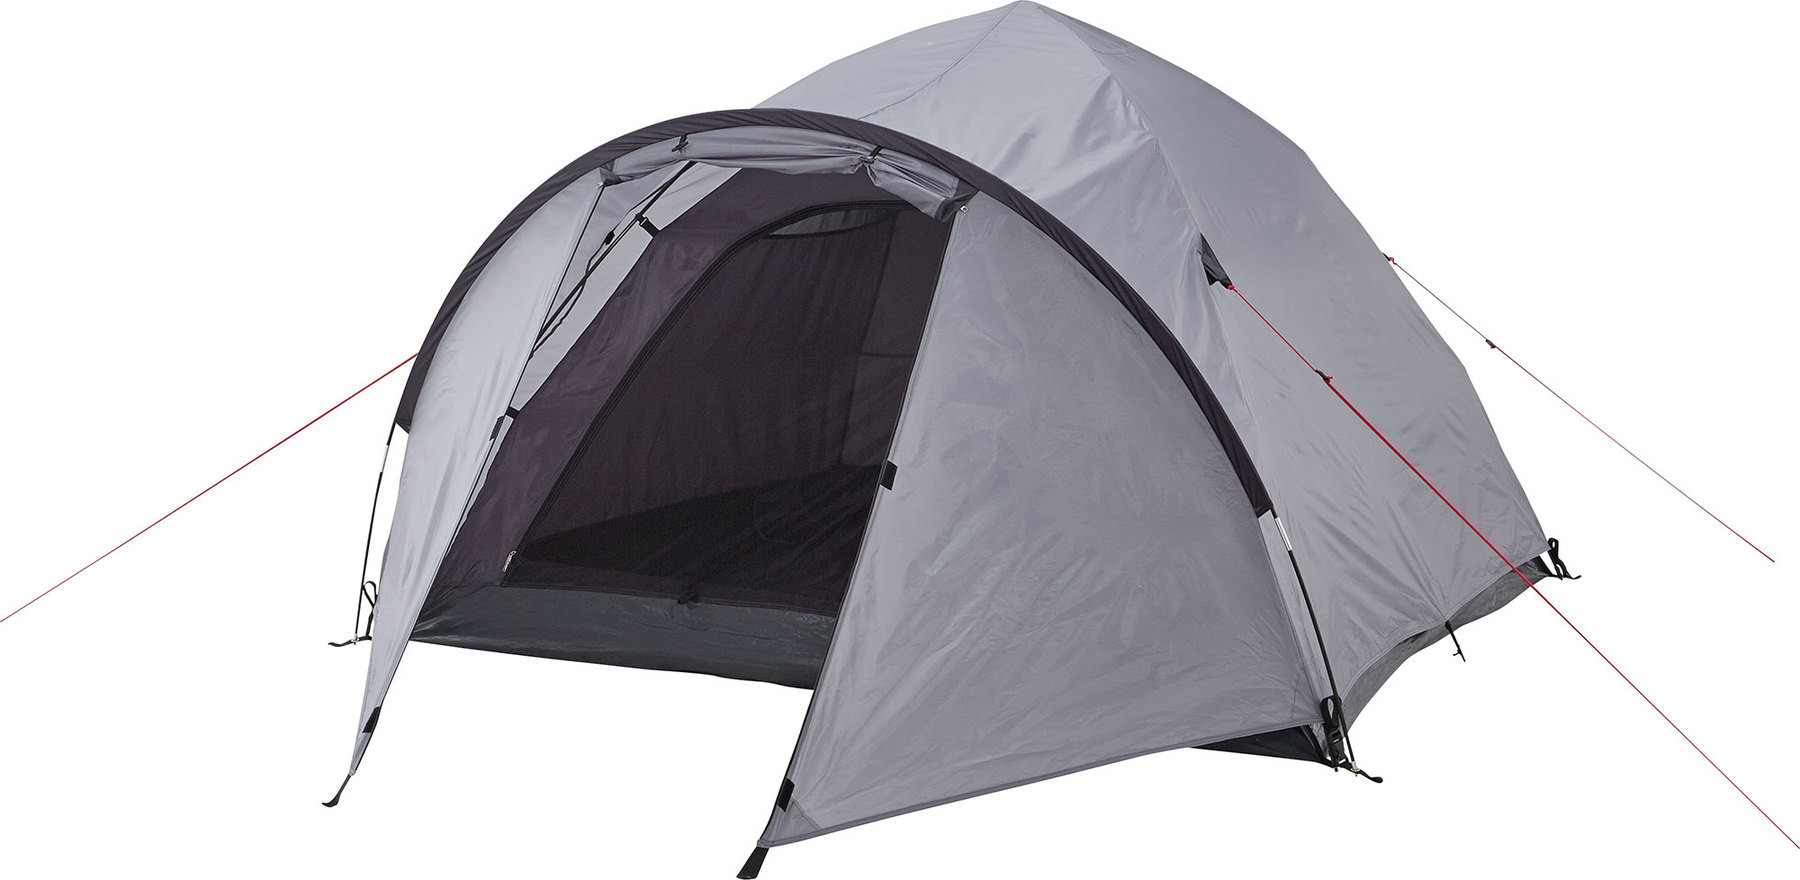 Nordkap *Svelvik* grå 2 lags quick up telt køb   Louis